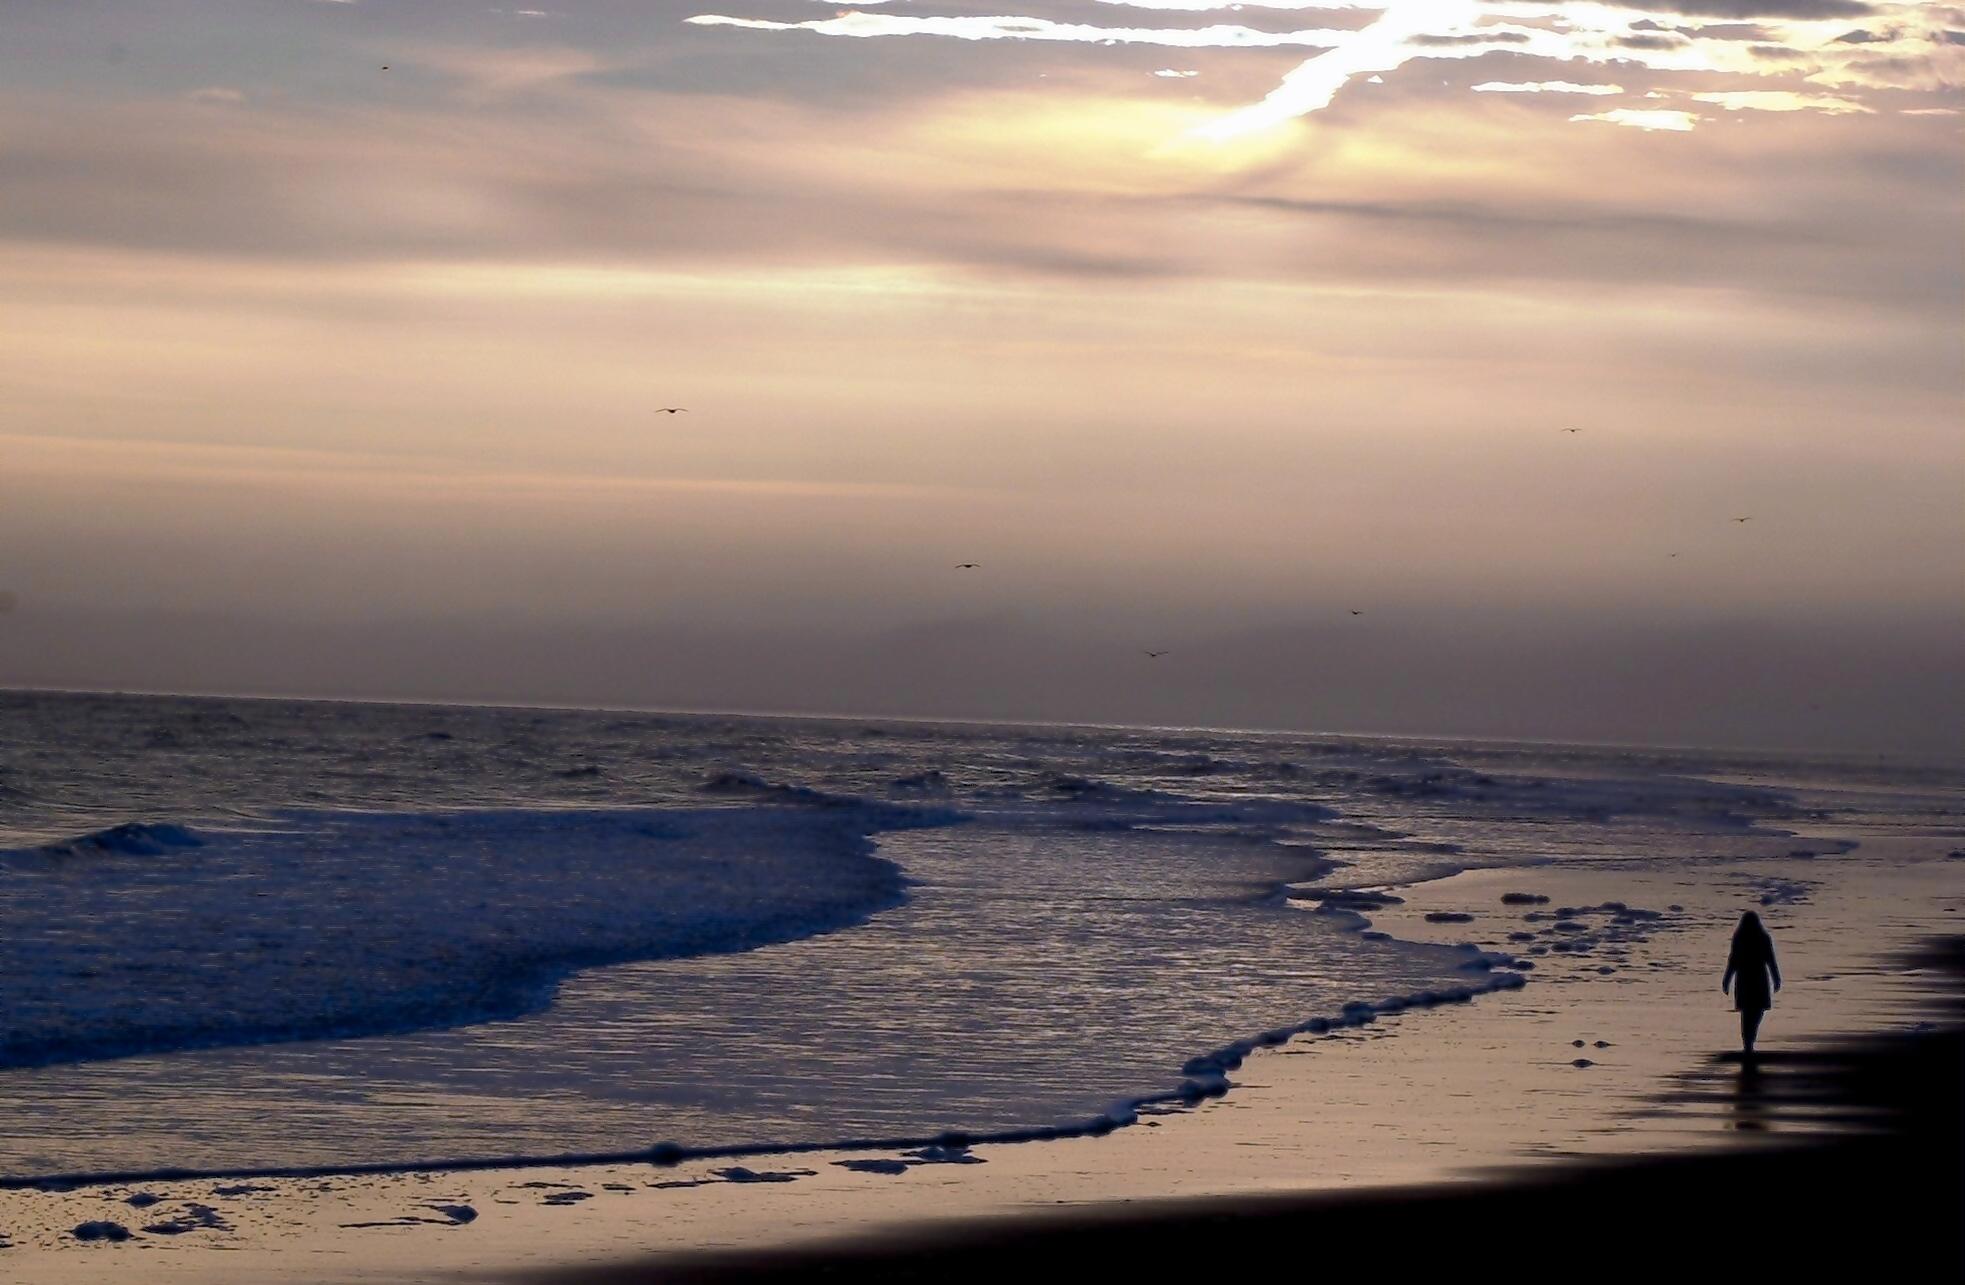 SCOTTISH LIFE - AN EARLY MORNING STROLL ON DORNOCH BEACH. PIC COLIN RENNIE.